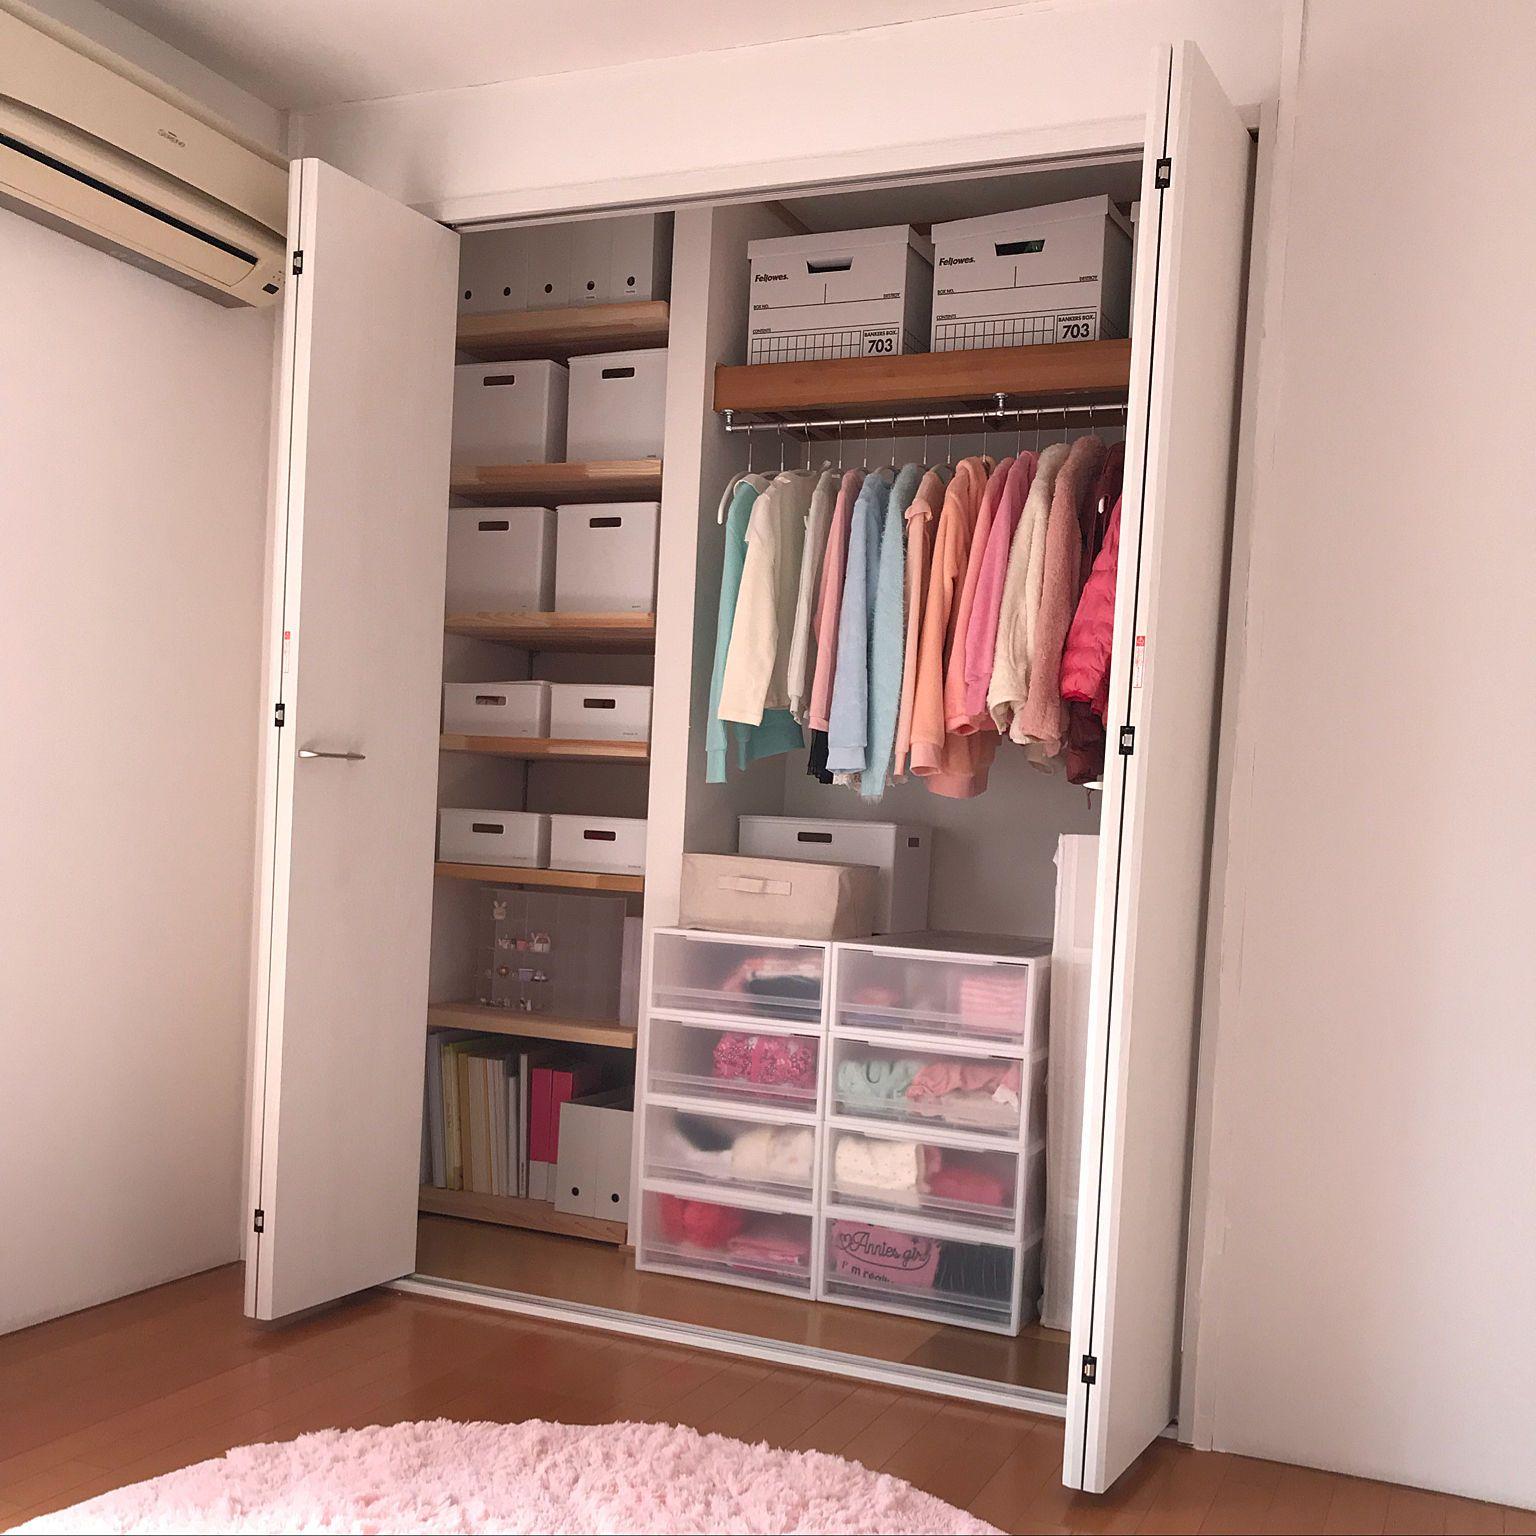 9a5b0934da3 Bedroom/無印良品/クローゼット/収納/リフォーム/シンプルライフ.